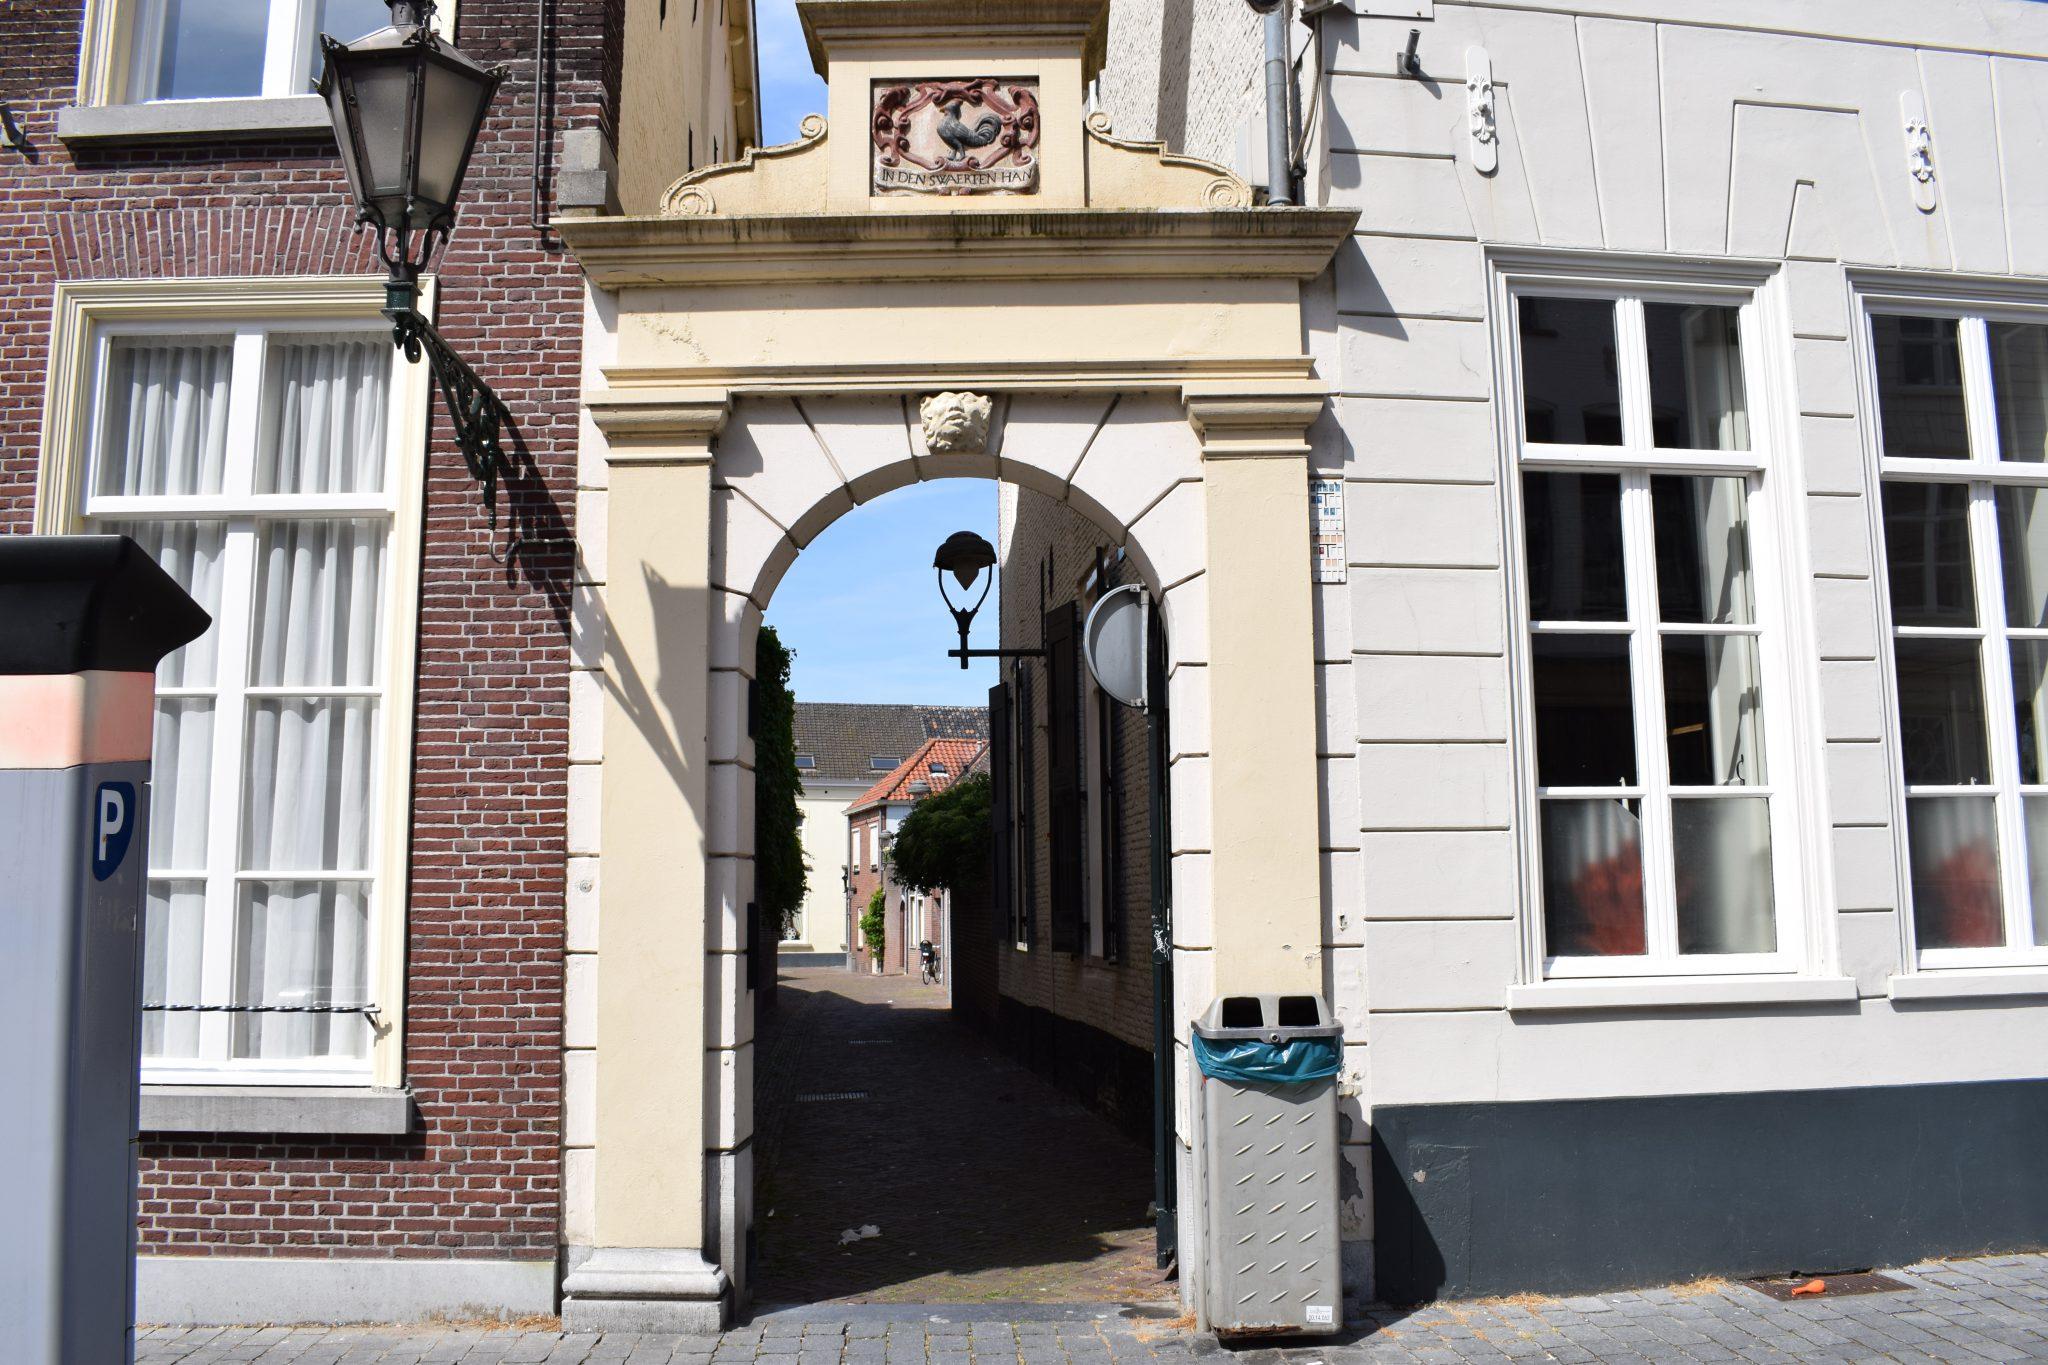 morganstraat